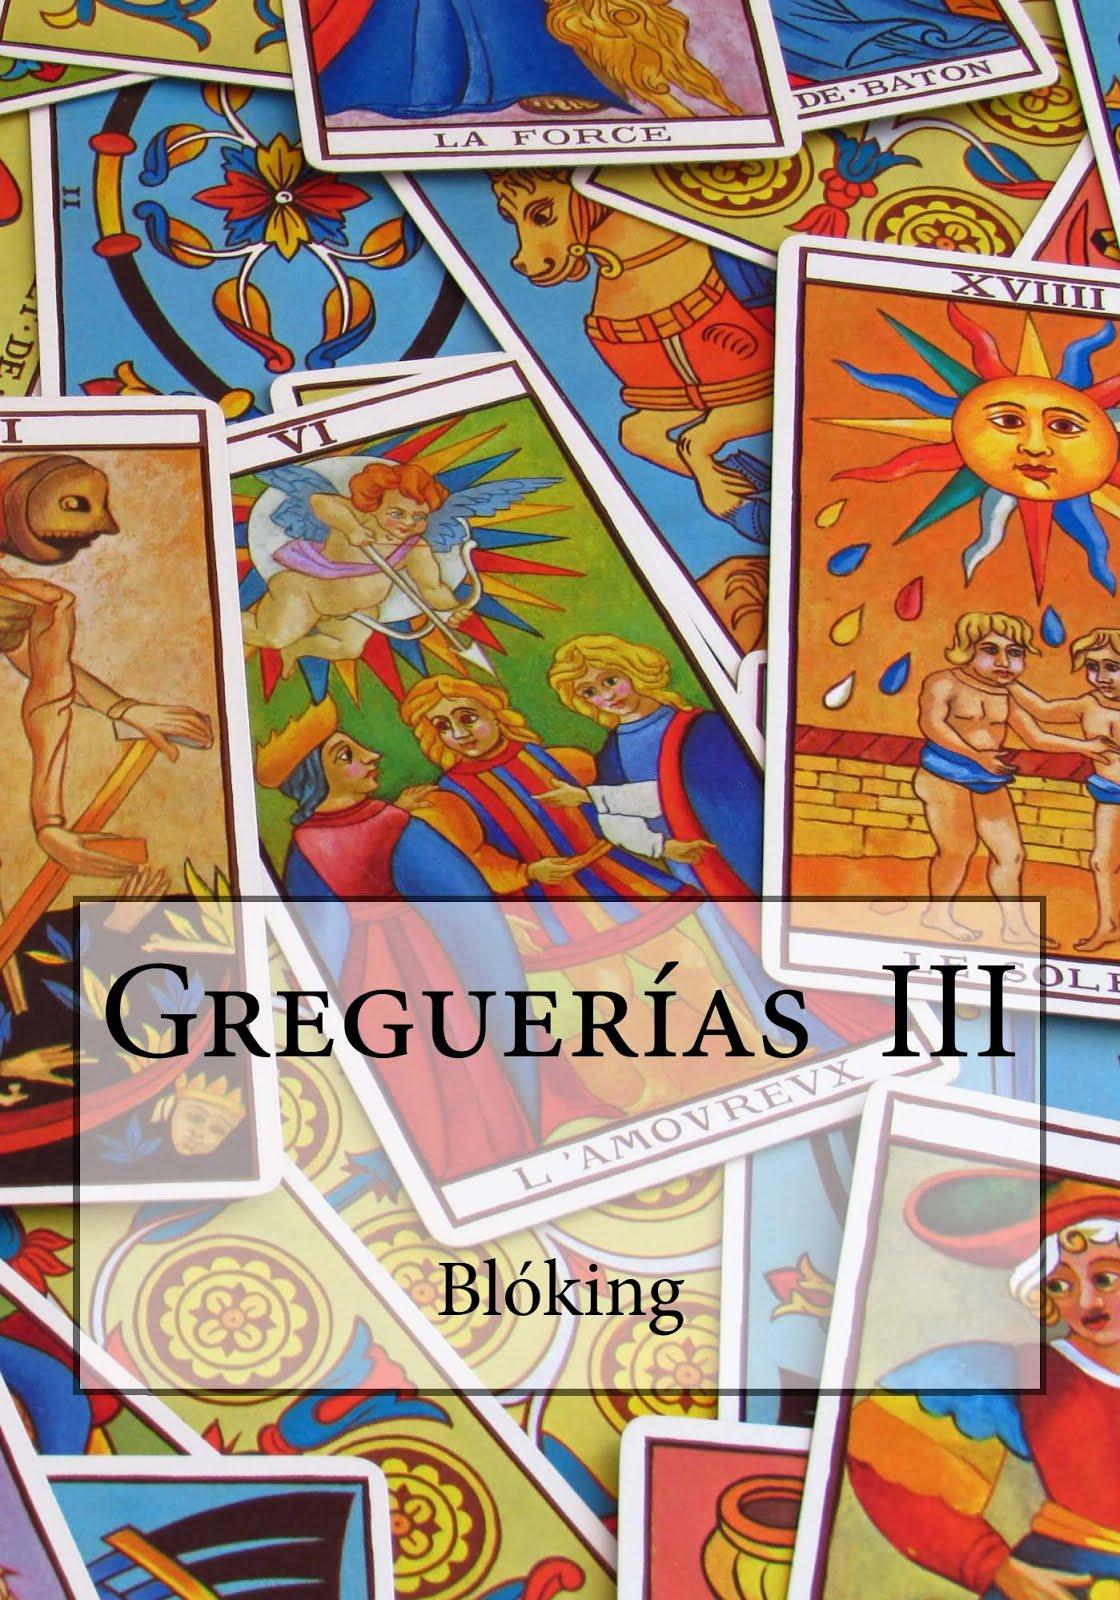 #Obra 48 - Greguerías III